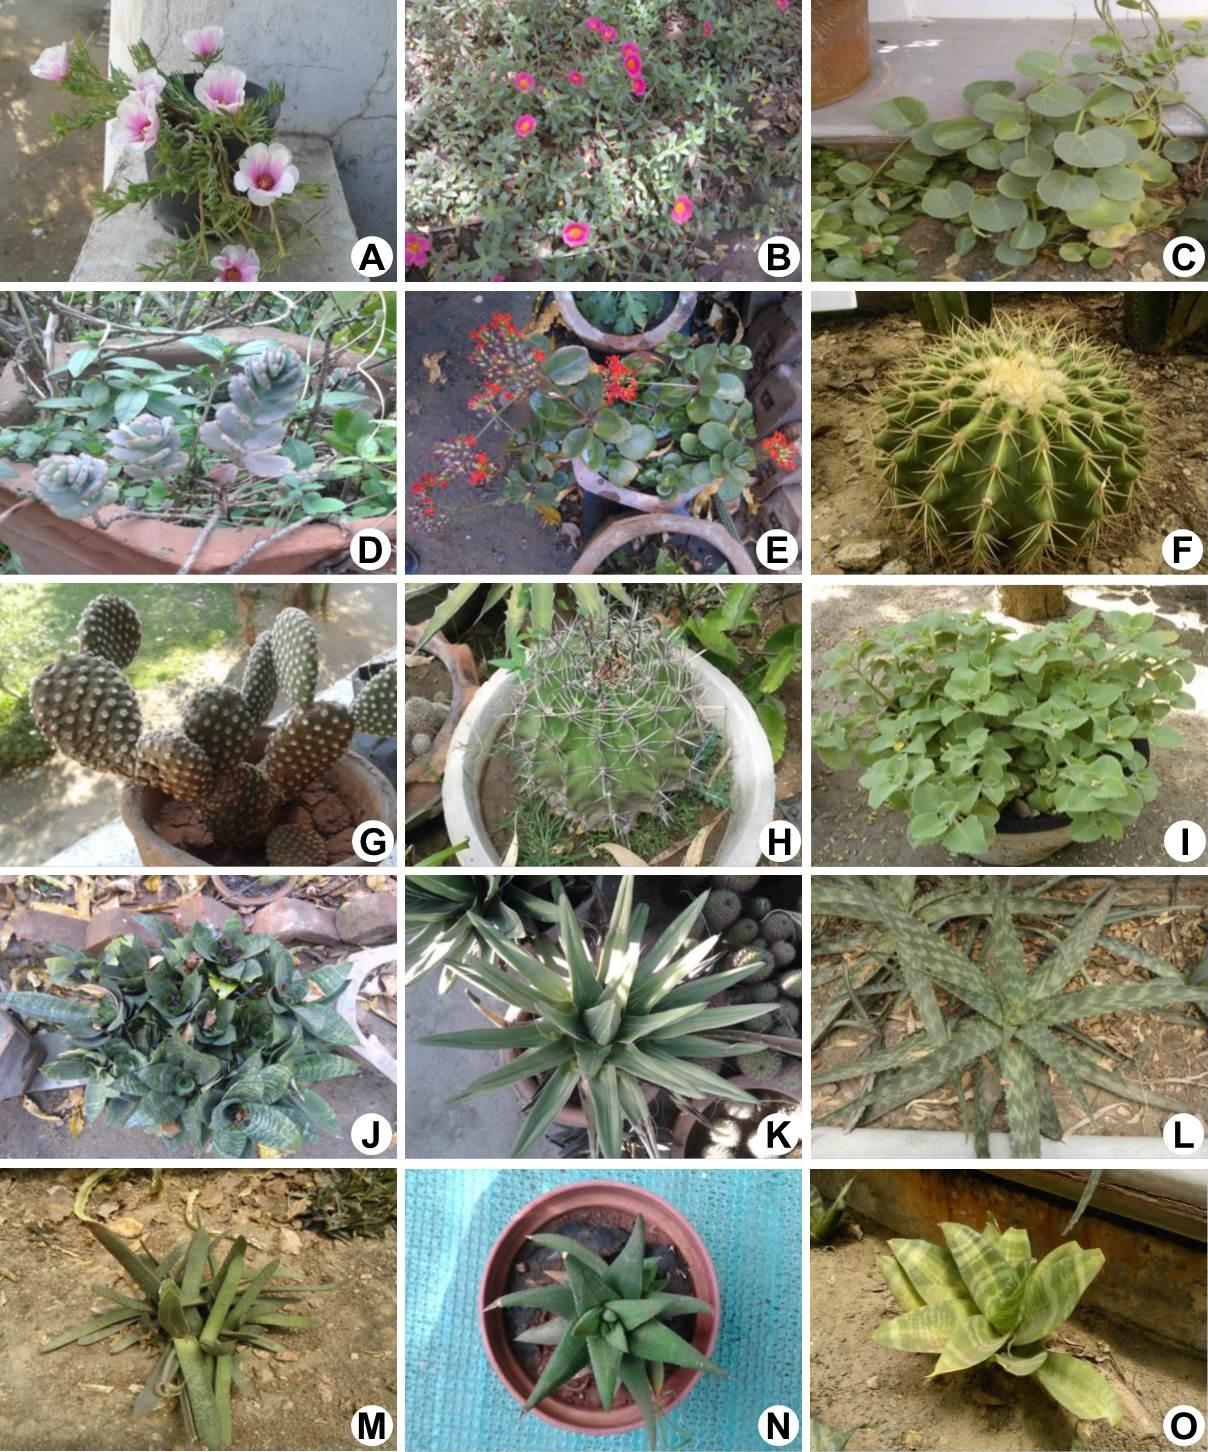 Photographs of some succulents: A, Portulaca pilosa Linn. Spp. Grandiflora(Hook.) Gesink; B, Portulaca pilosa L.; C, Cissus rotundifolia Vahl; D, Bryophyllum fedtschenkoi (Raym.-Hamet & H.Perrier) Lauz.-March; E, Kalanchoe blossfeldiana Poelln; F, Echinocactus grusonii Hildm; G, Opuntia microdasys (Lehm.) Pfeiff.; H, Ferocactus peninsulae (A.A.Weber) Britton & Rose; I, Plectranthus amboinicus (Lour.) Spreng; J, Aechmea fasciata (Lindl.) Baker.; K, Agave victoriae-reginae T.Moore Gard.; L, Aloe maculata All.